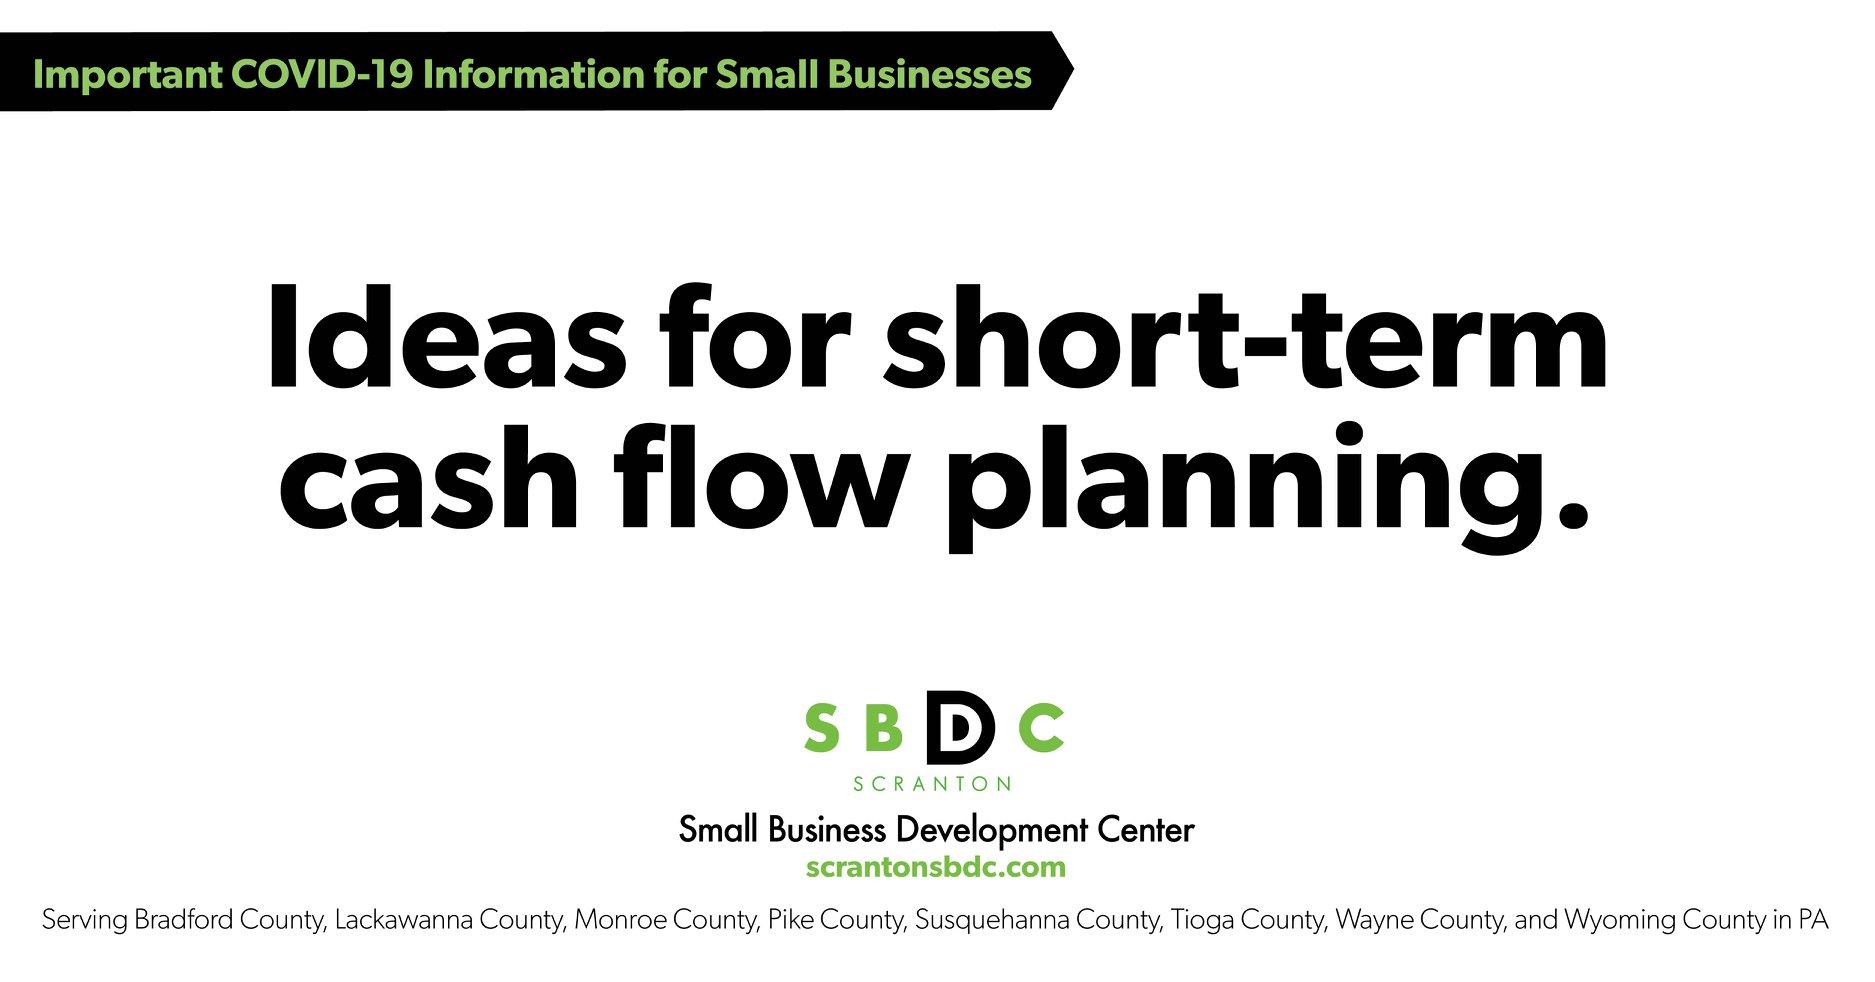 Small Business Ideas For Short Term Cash Flow Planning